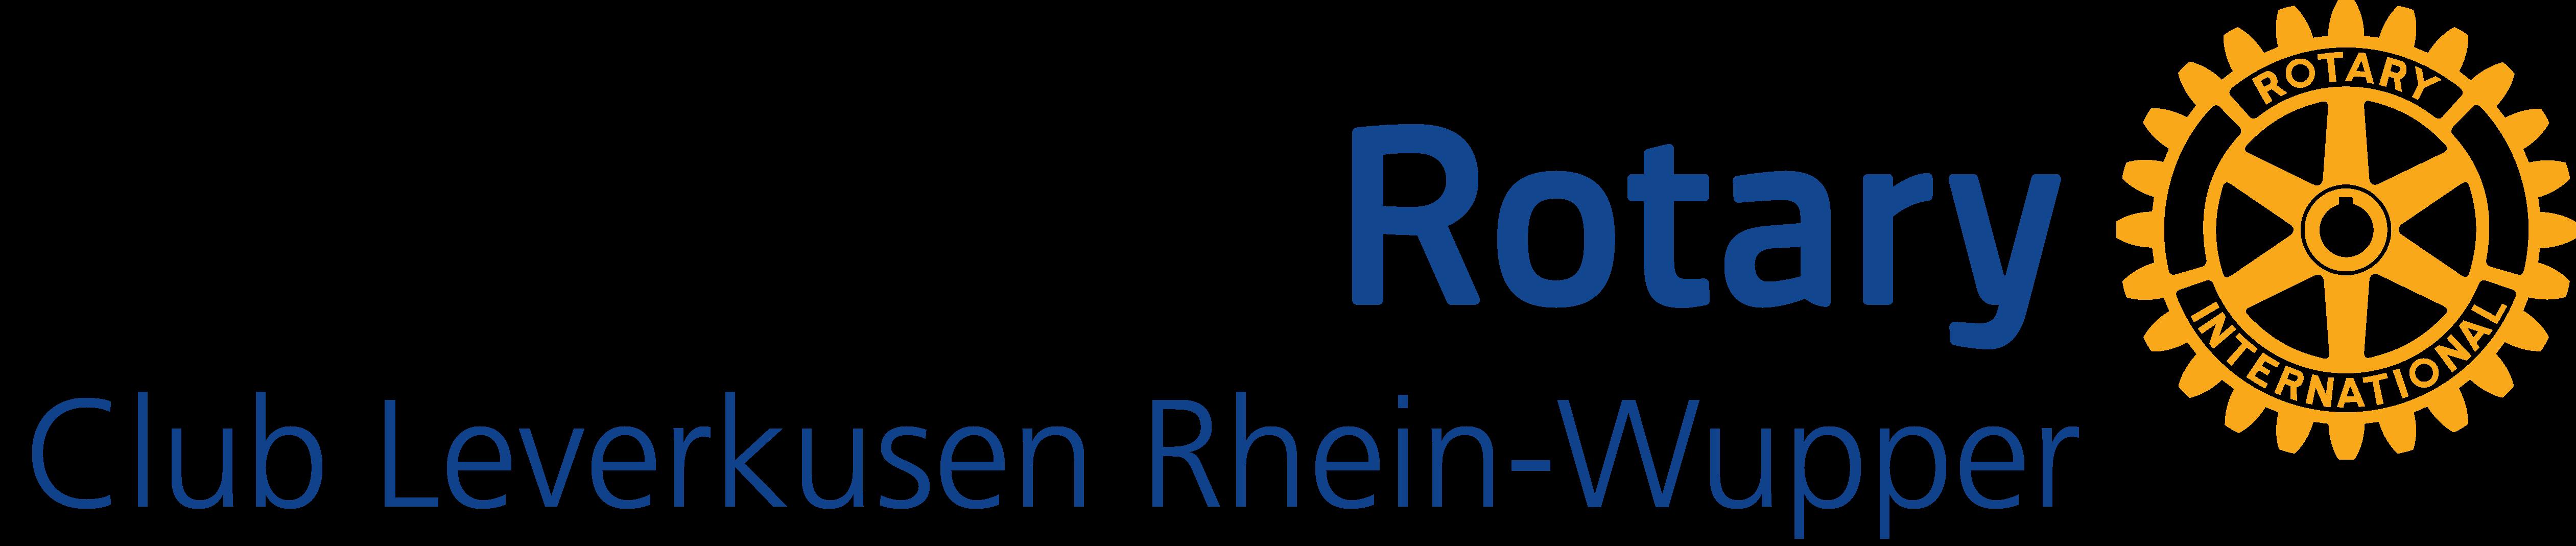 Rotary Club Leverkusen Rhein-Wupper